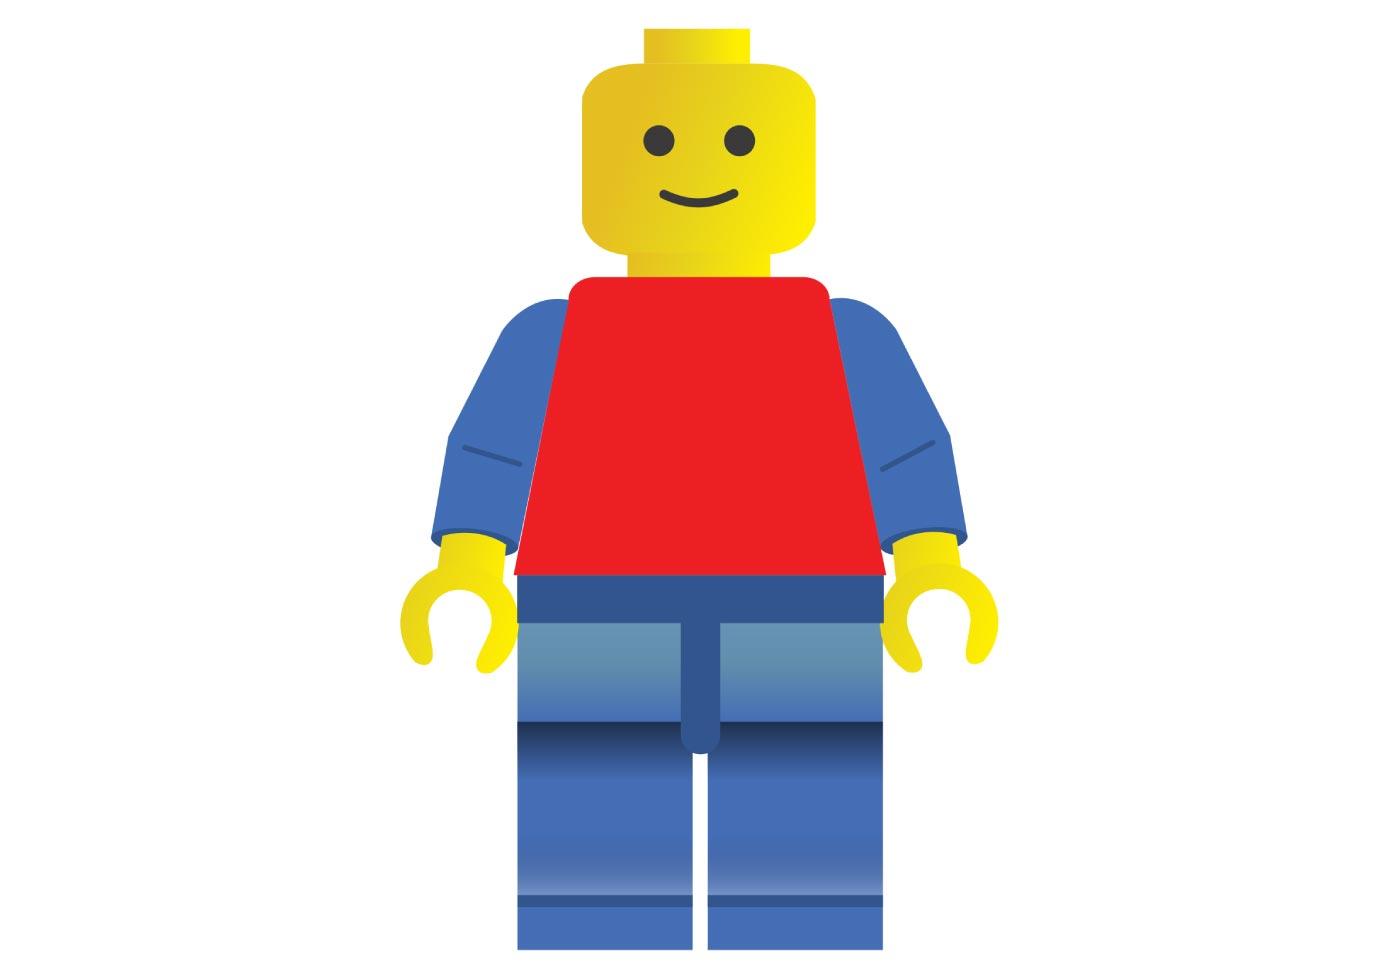 Free SVG Lego Vector Man   Free Vector Art at Vecteezy!